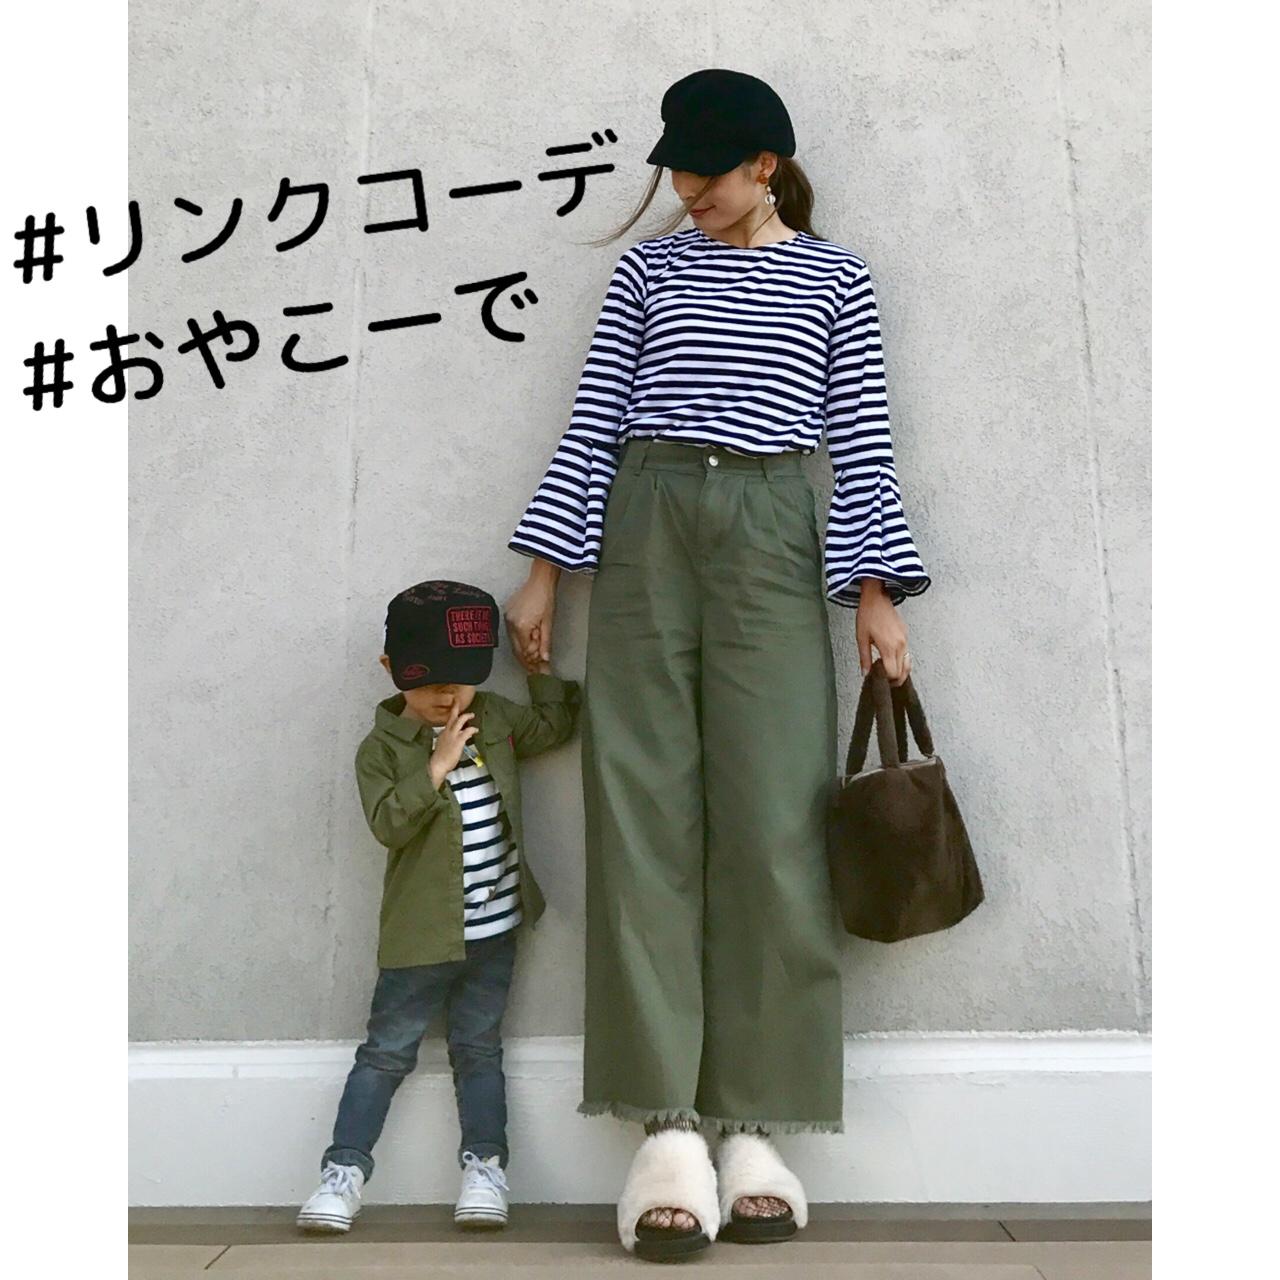 dbc15425bf1cf Fashion. mi-chan さん フォローする. 5  0.  おやこーで 親子コーデ リンク ...